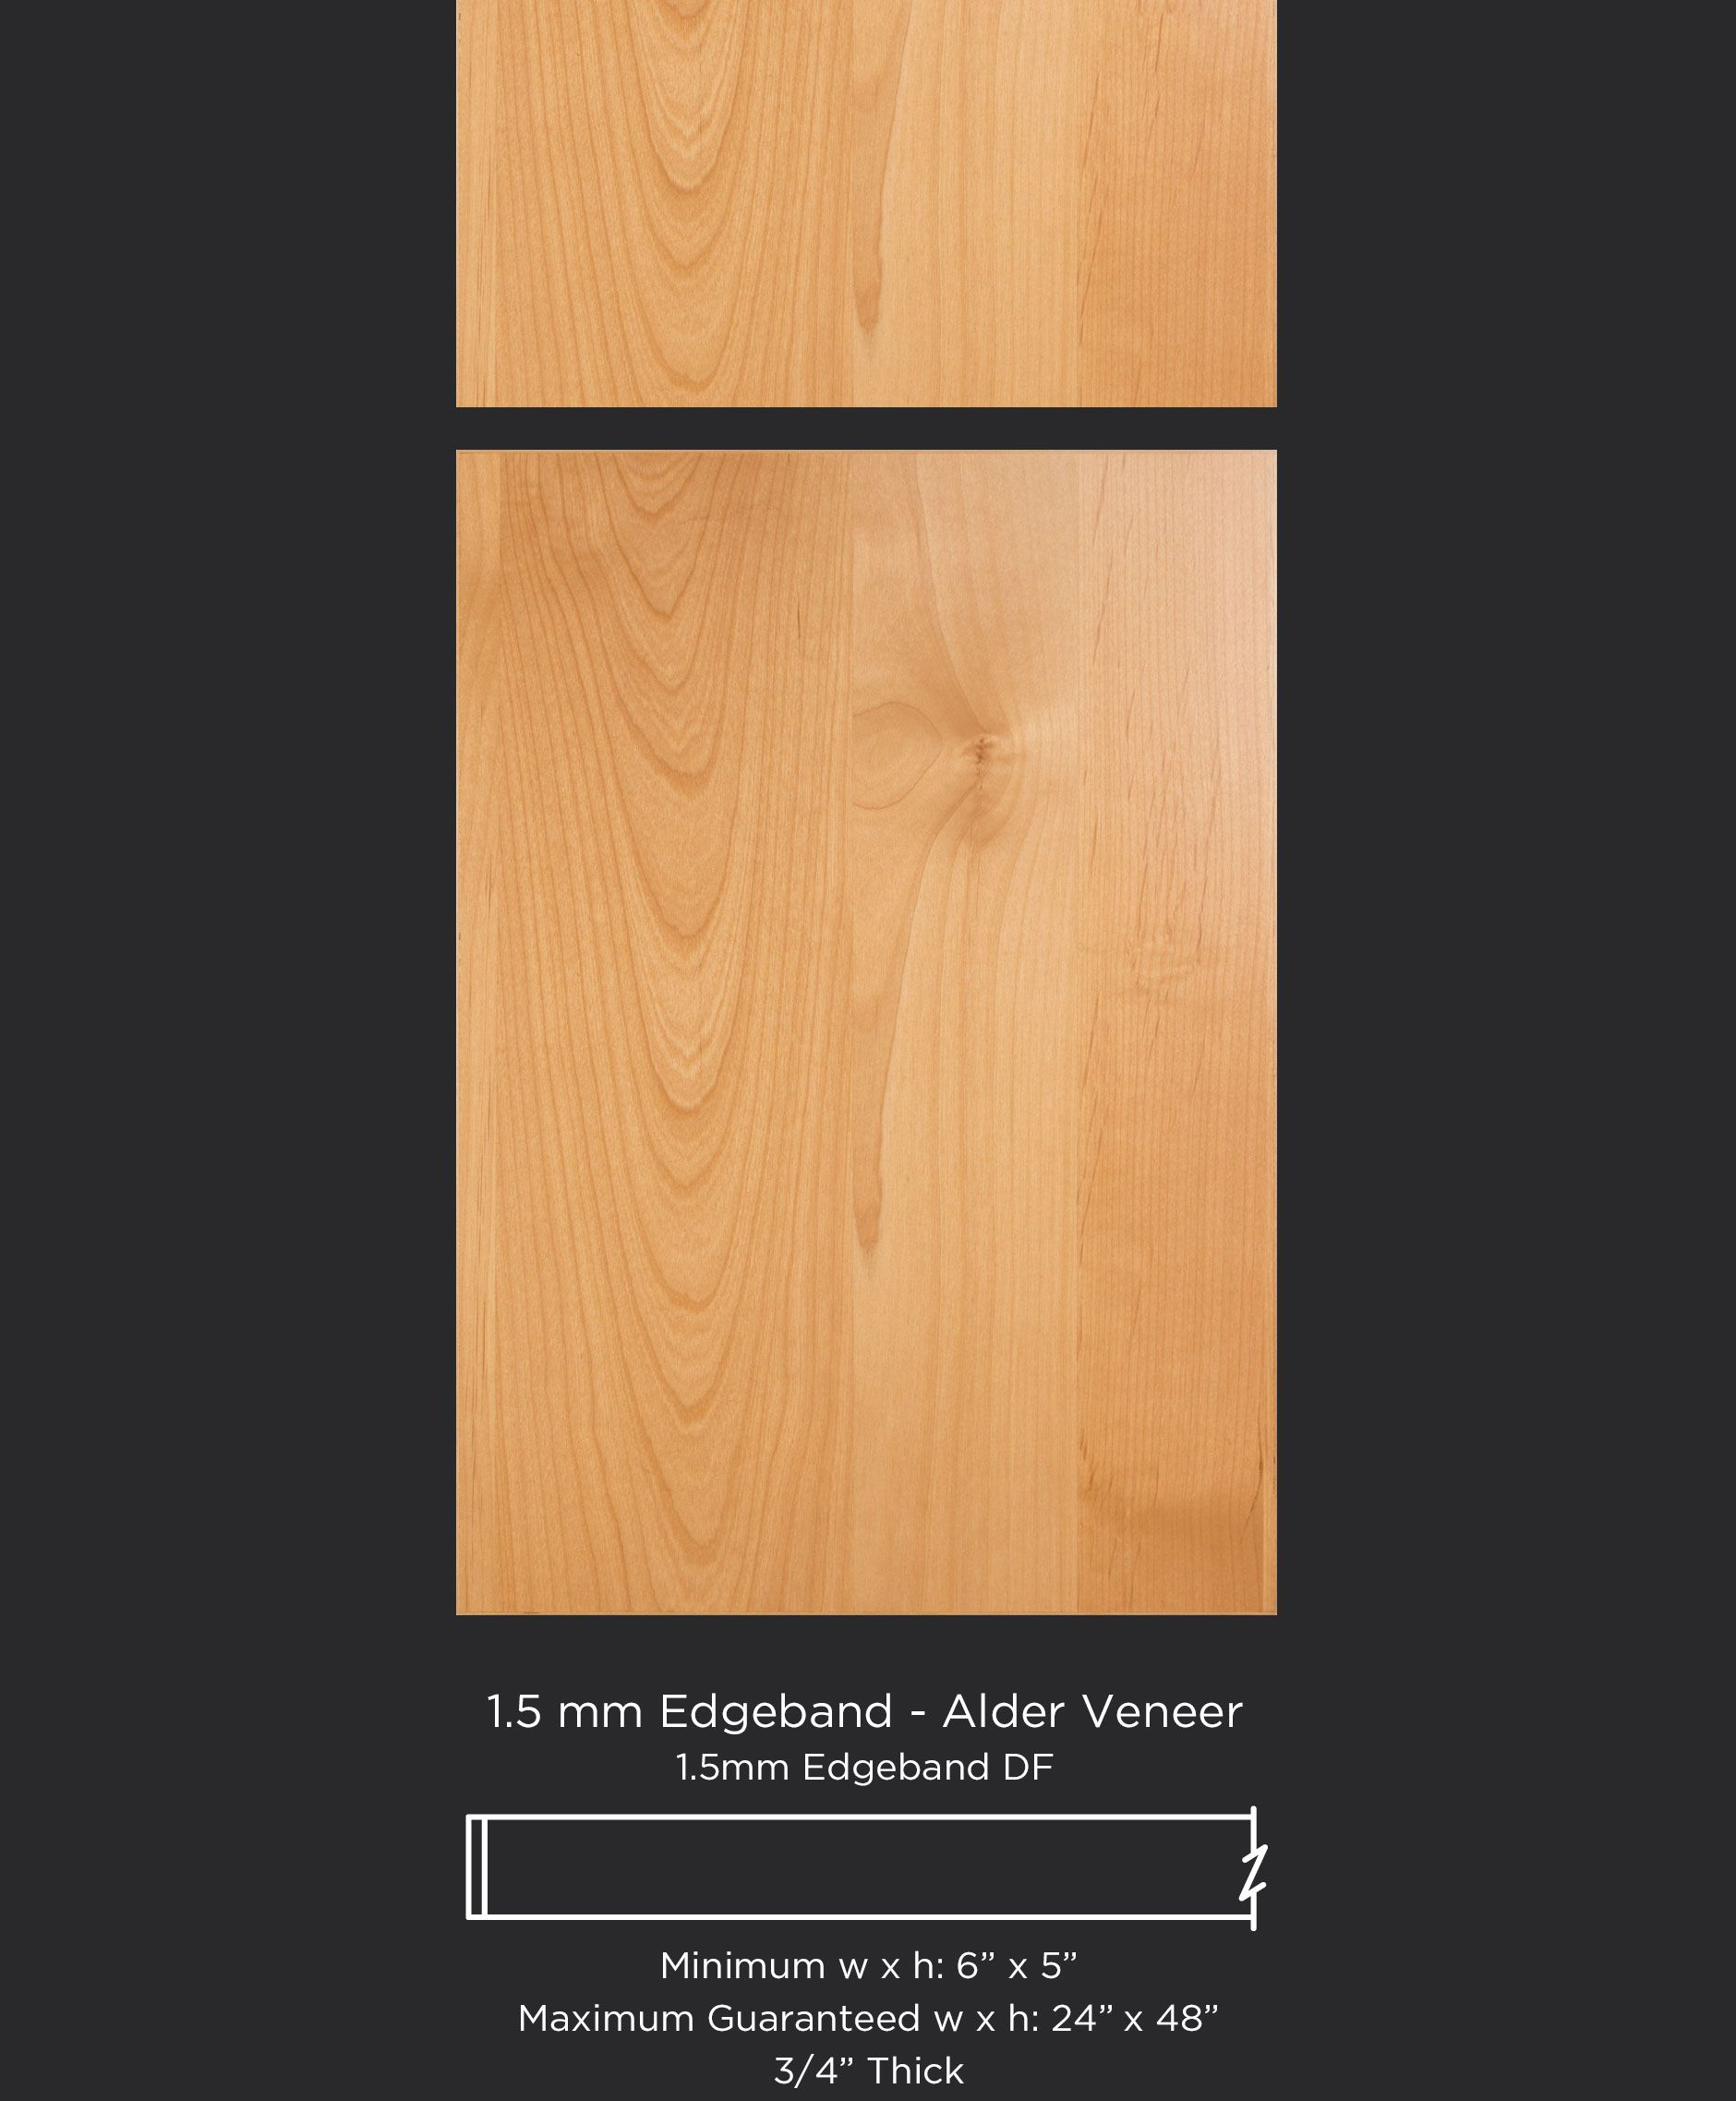 1 5 Mm Edgeband Alder Veneer Taylorcraft Cabinet Door Company Cabinet Doors Custom Cabinet Doors Veneers